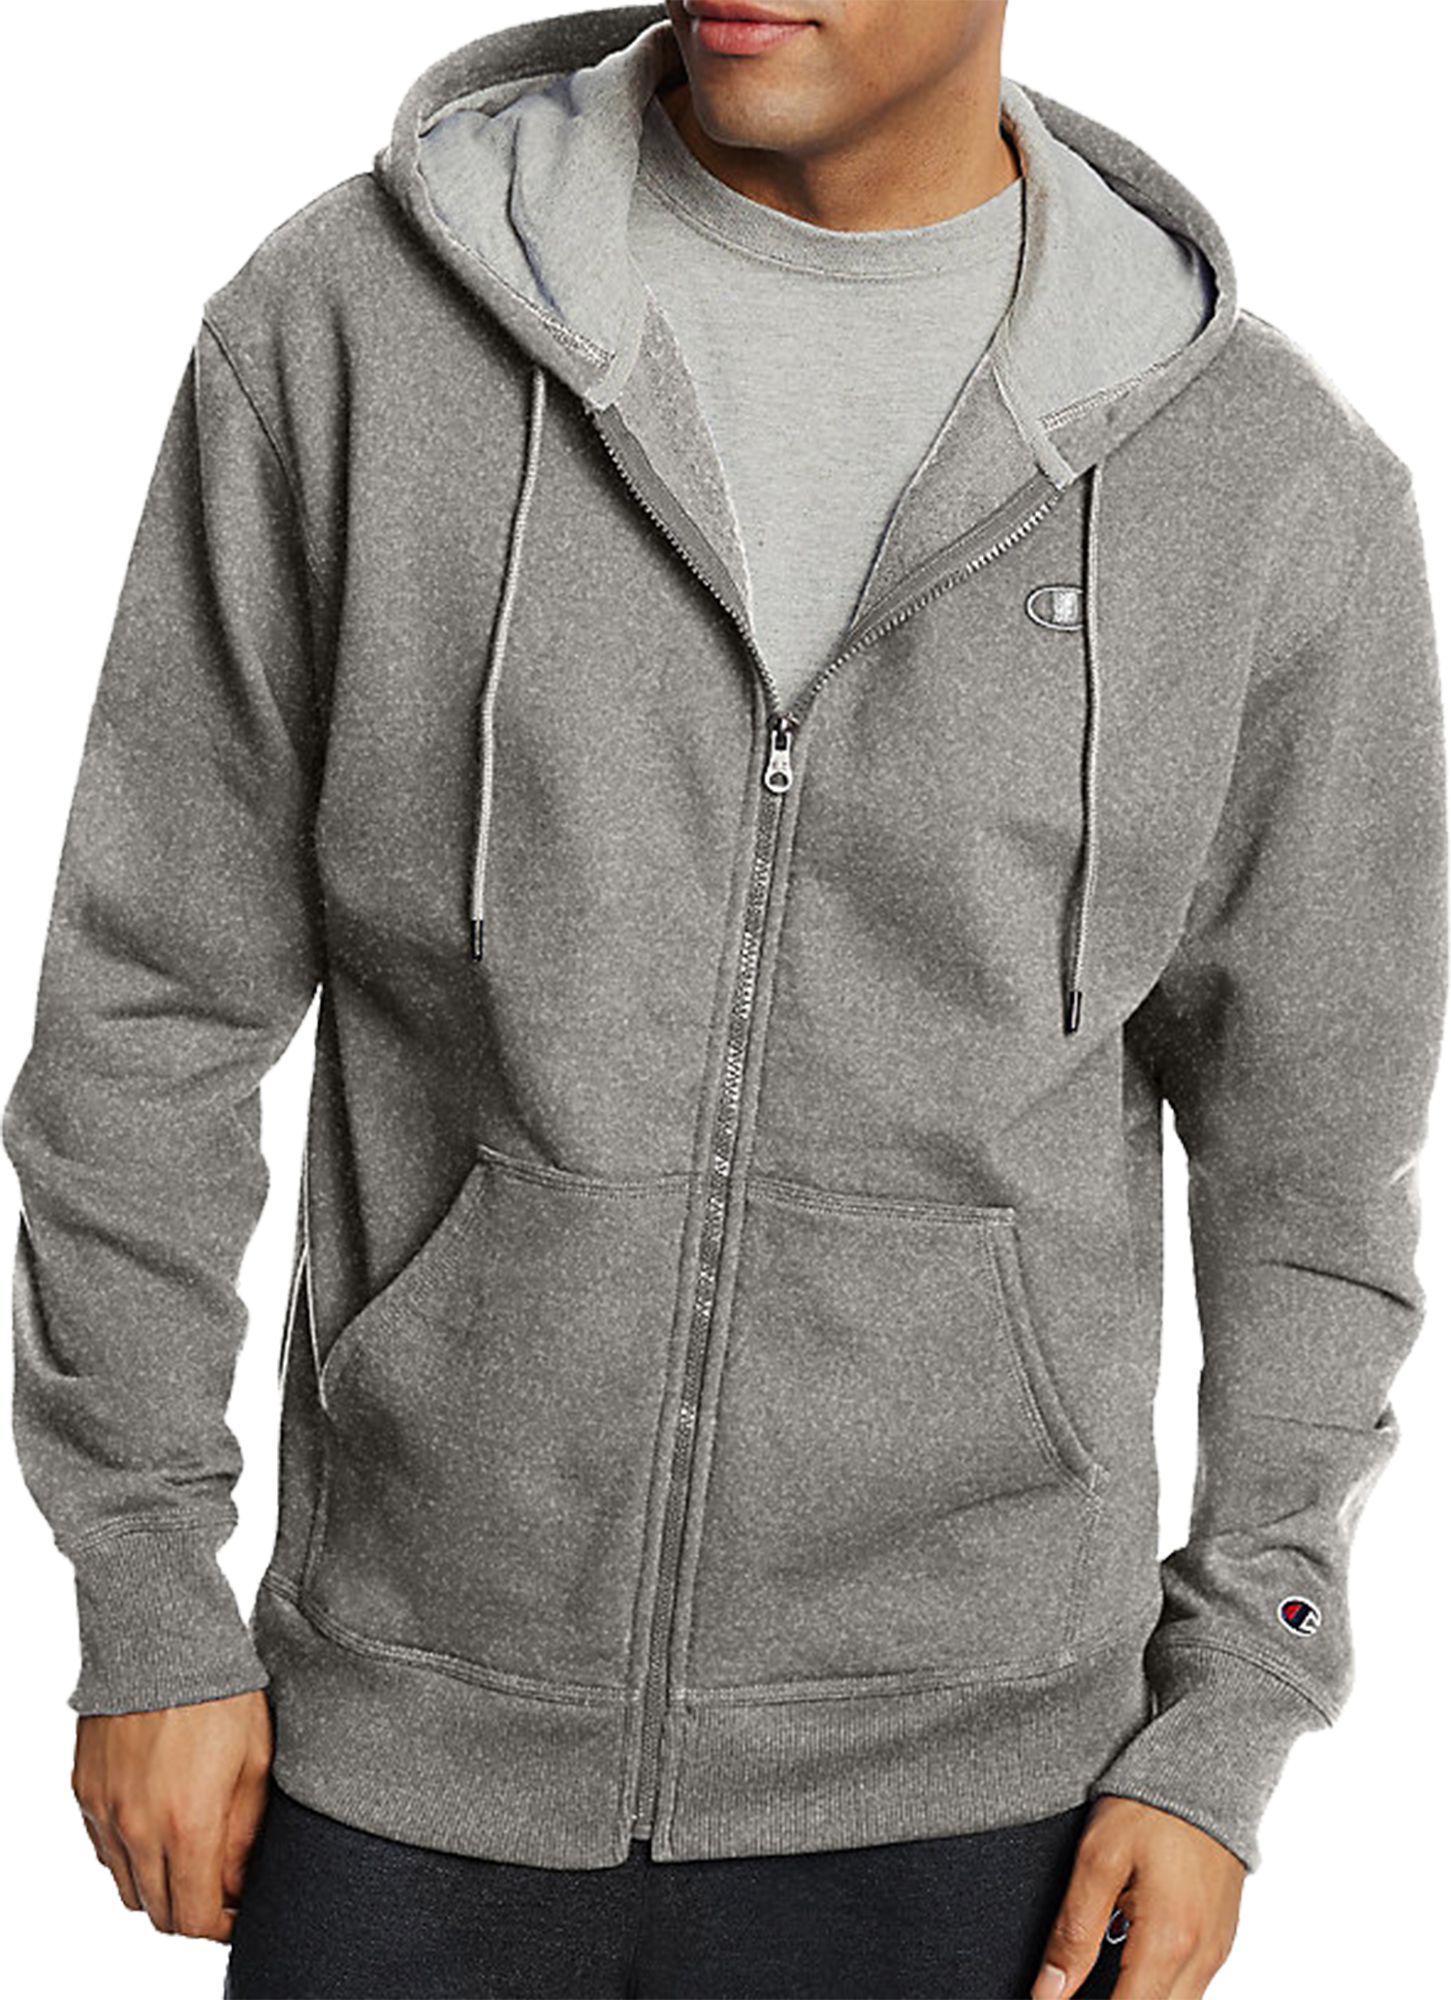 fac0cef1200d Lyst - Champion Powerblend Full Zip Fleece Hoodie in Gray for Men